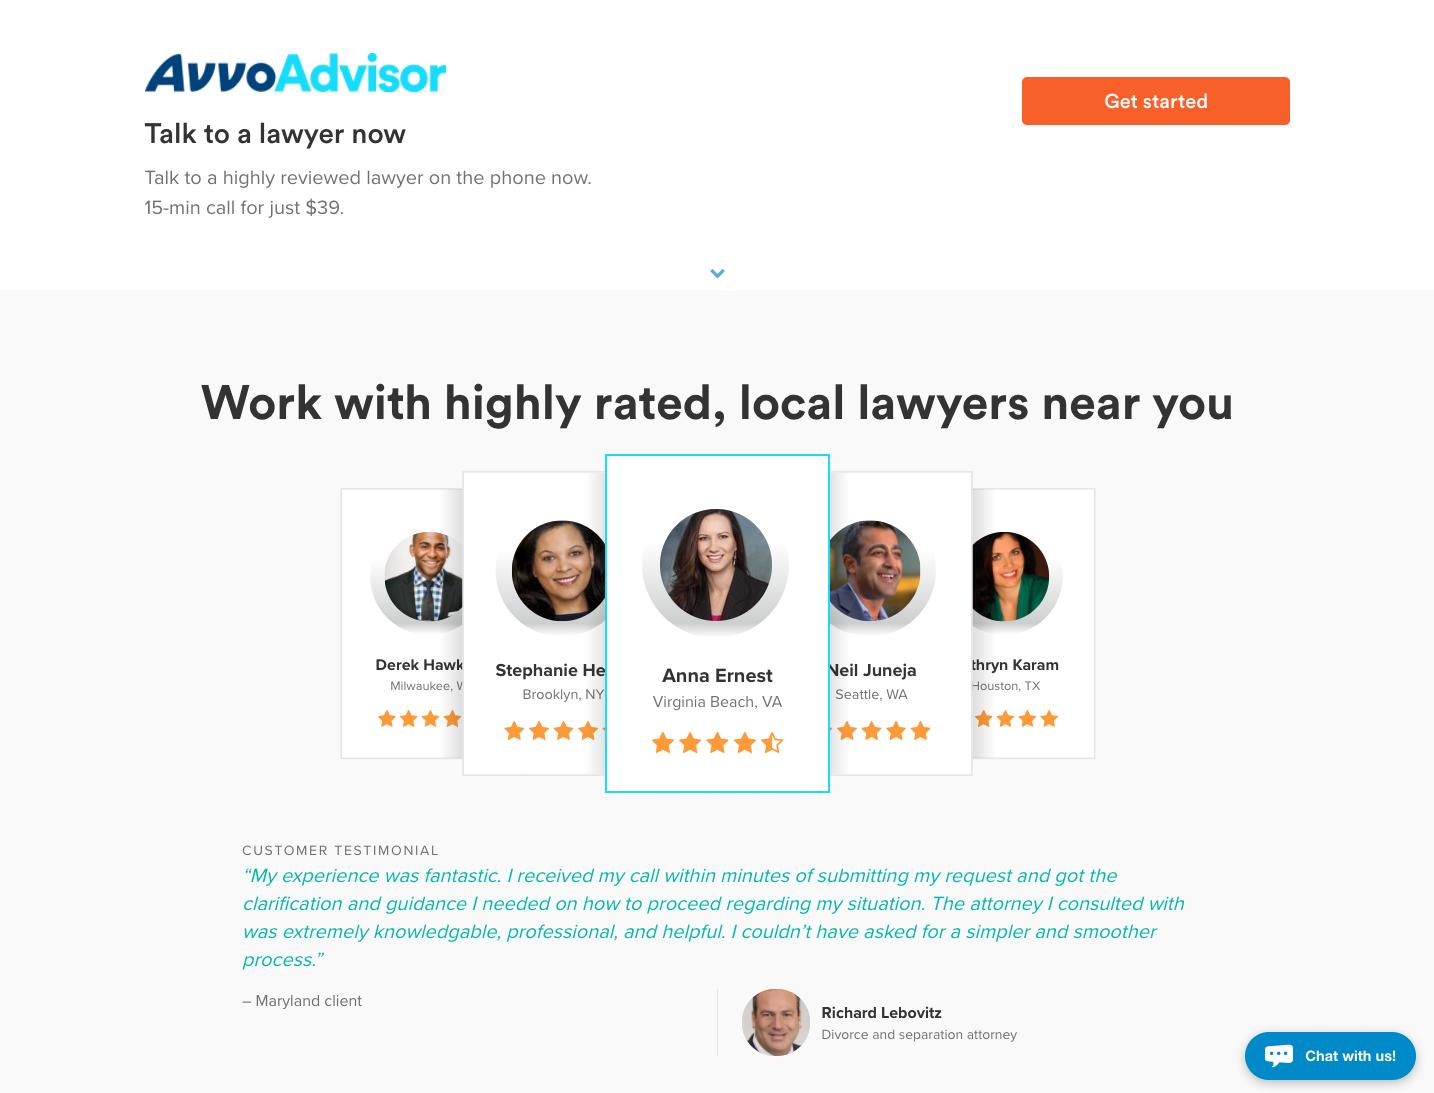 Pro Bono Legal Services Indiana